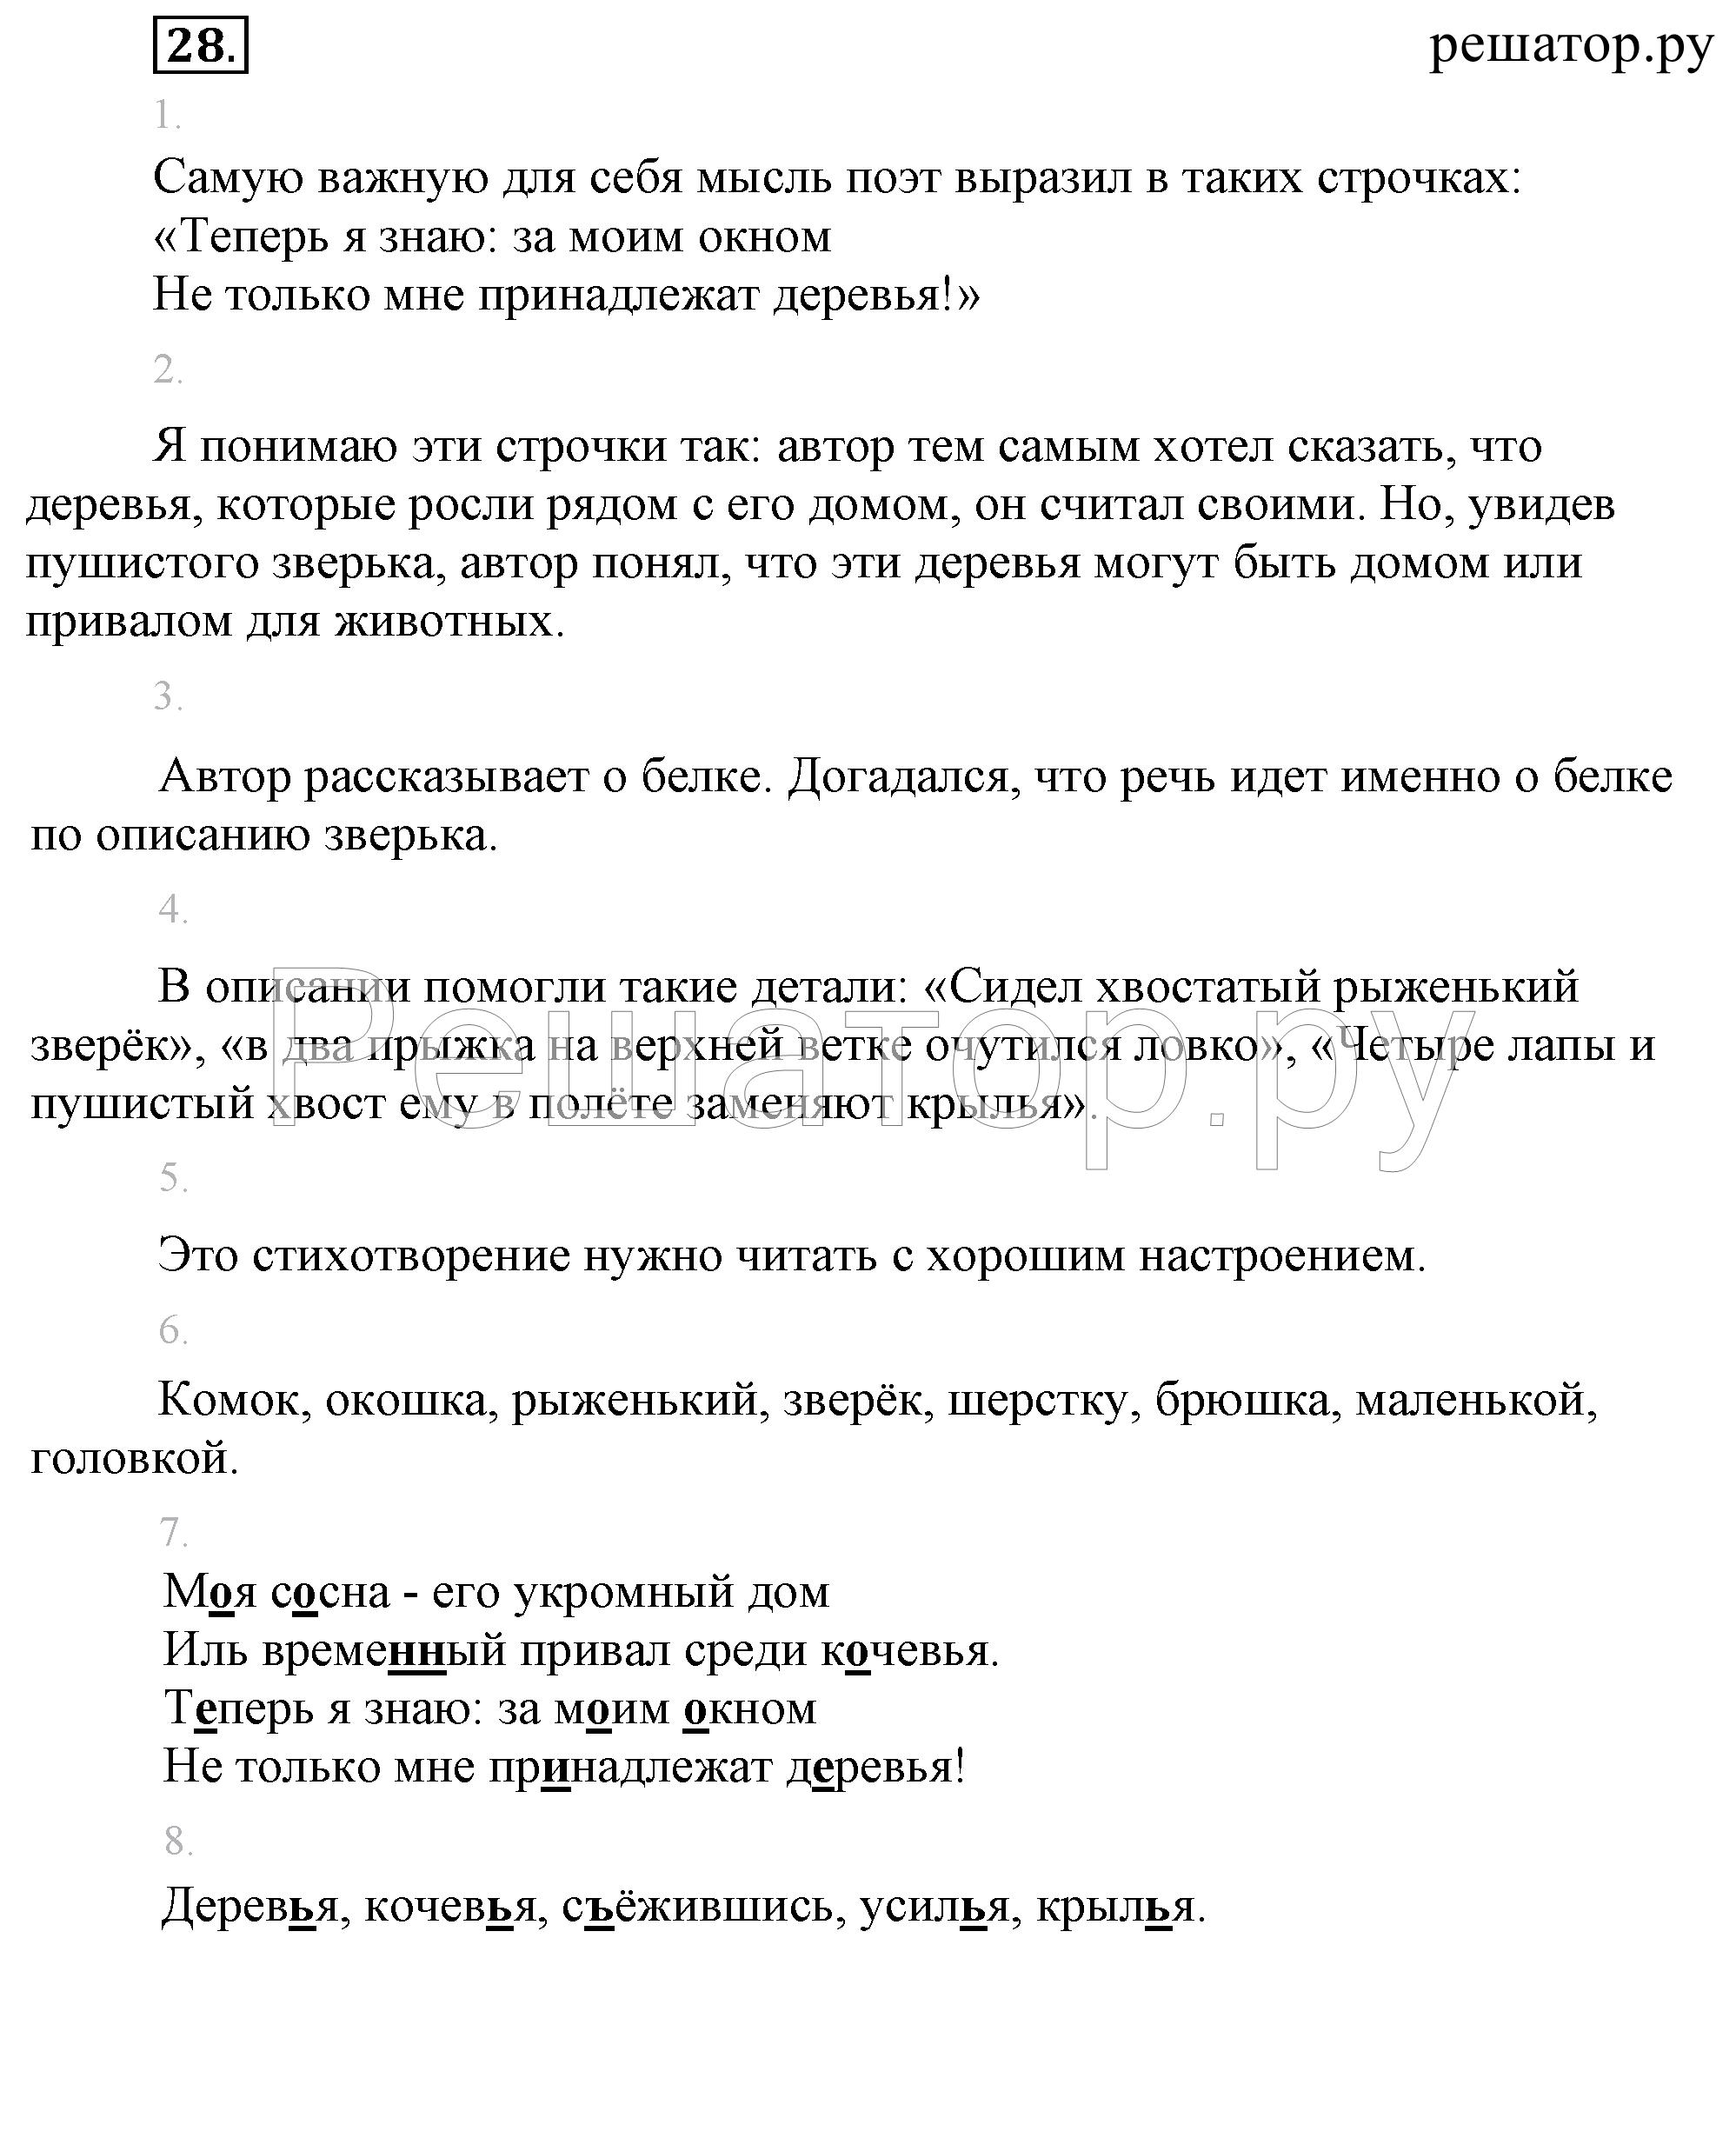 Упр.295 русский язык 6 класс бунеева